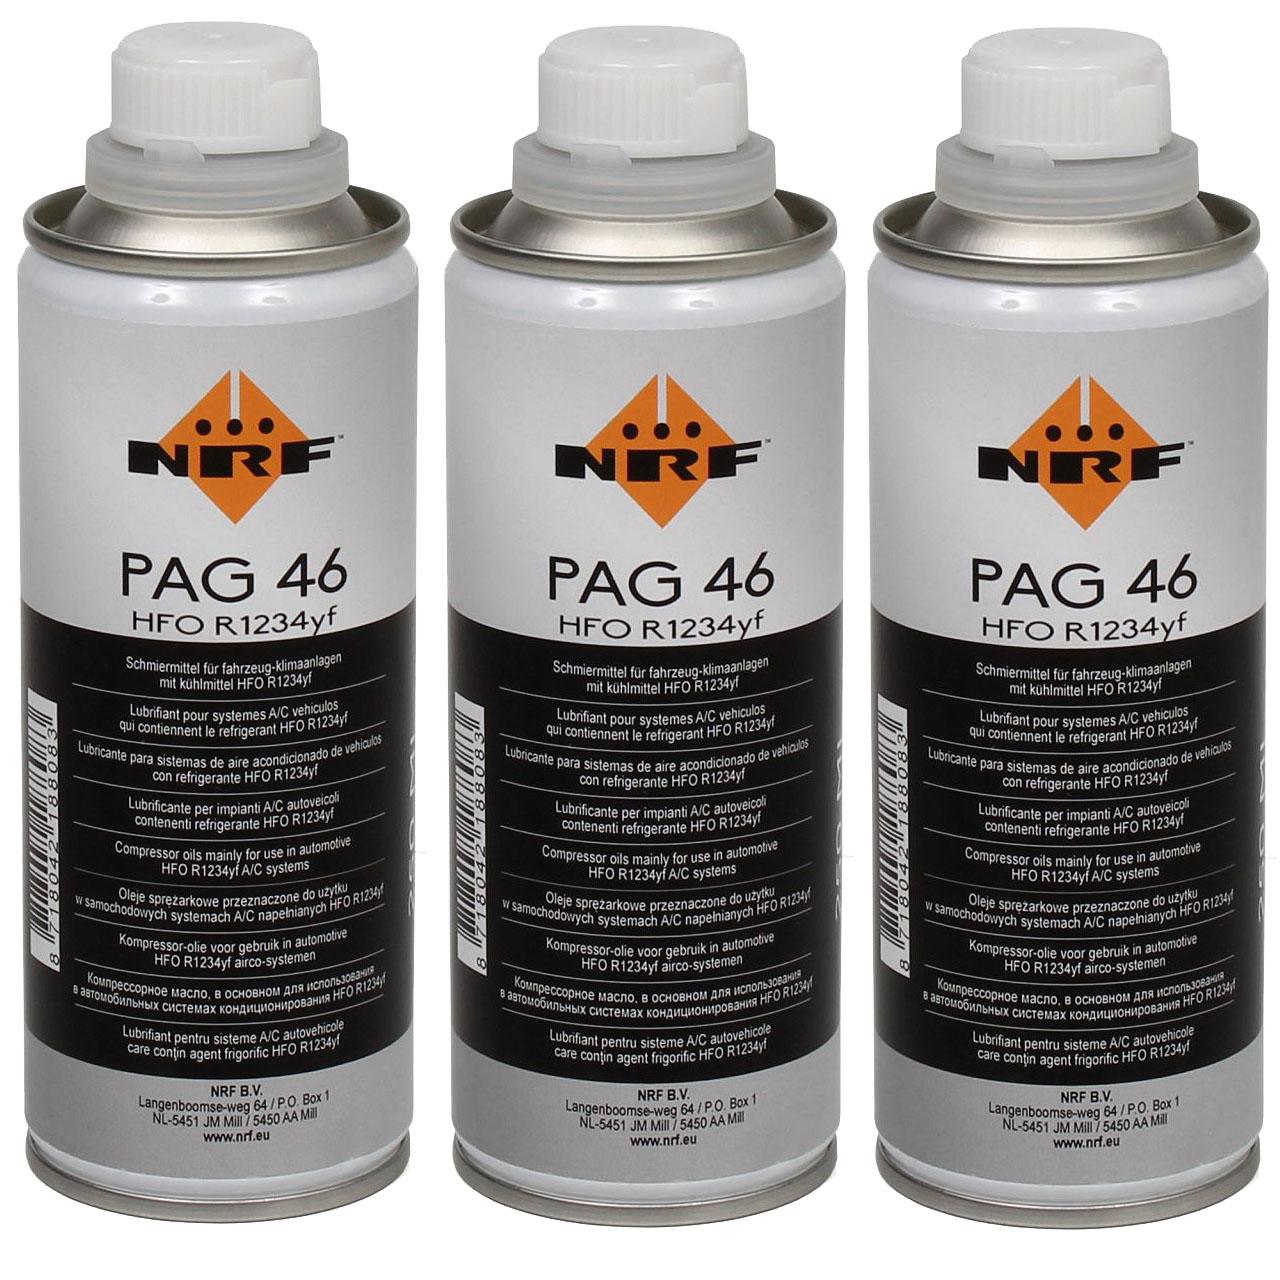 NRF 38837 Kompressor Öl Kompressoröl Klimaanlagenöl PAG 46 HFO R1234yf 750ml